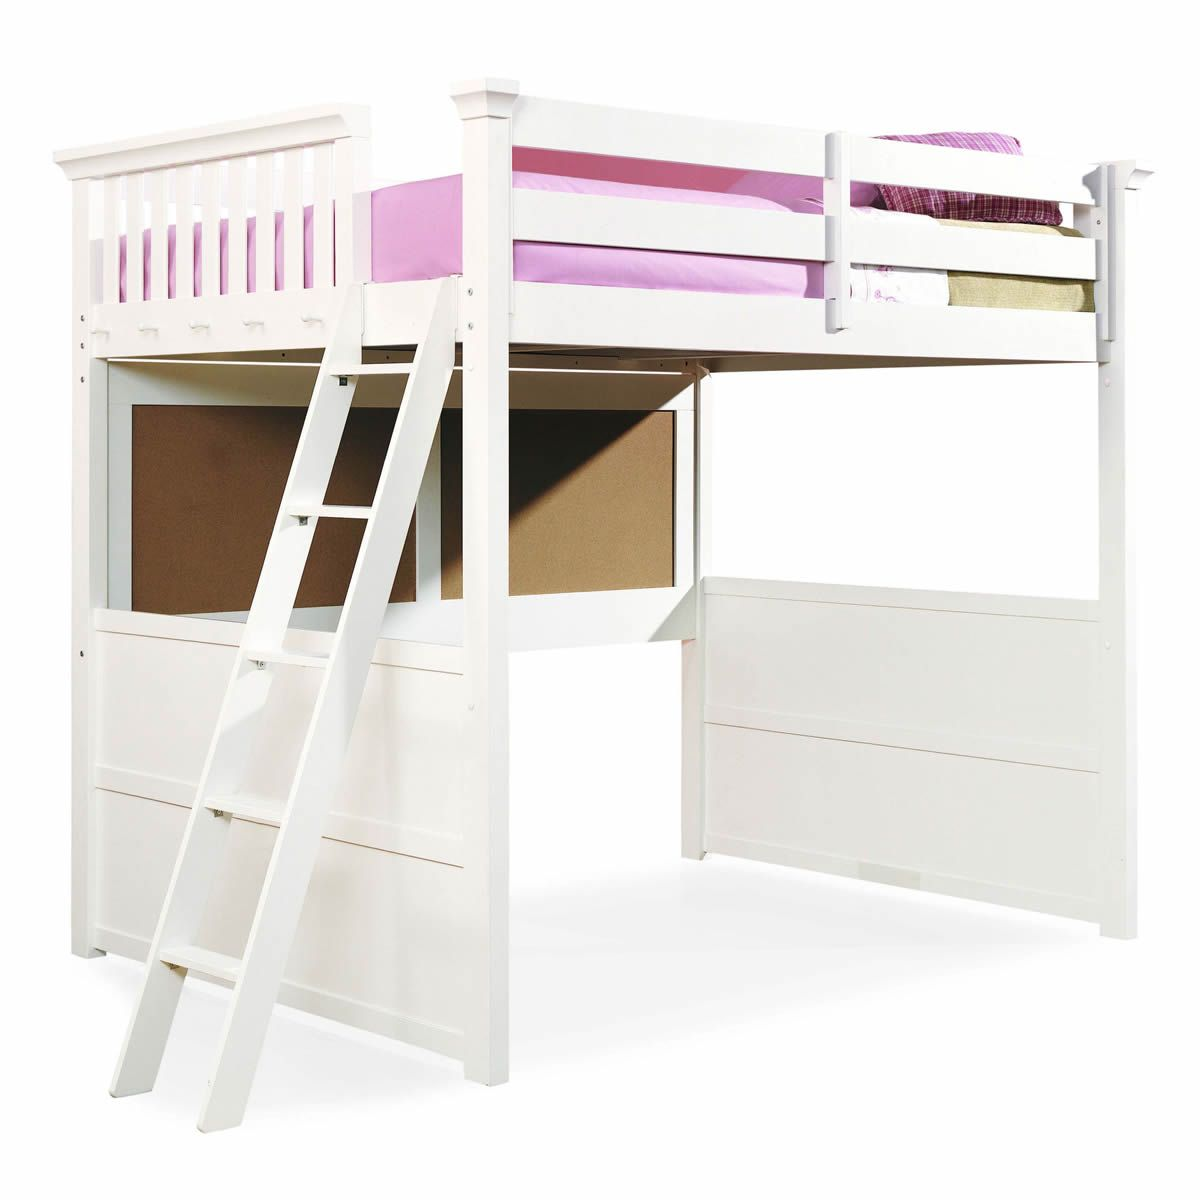 Loft bed ideas kids  Full Size Loft Beds For Girls  Bedroom Ideas  Pinterest  Loft bed